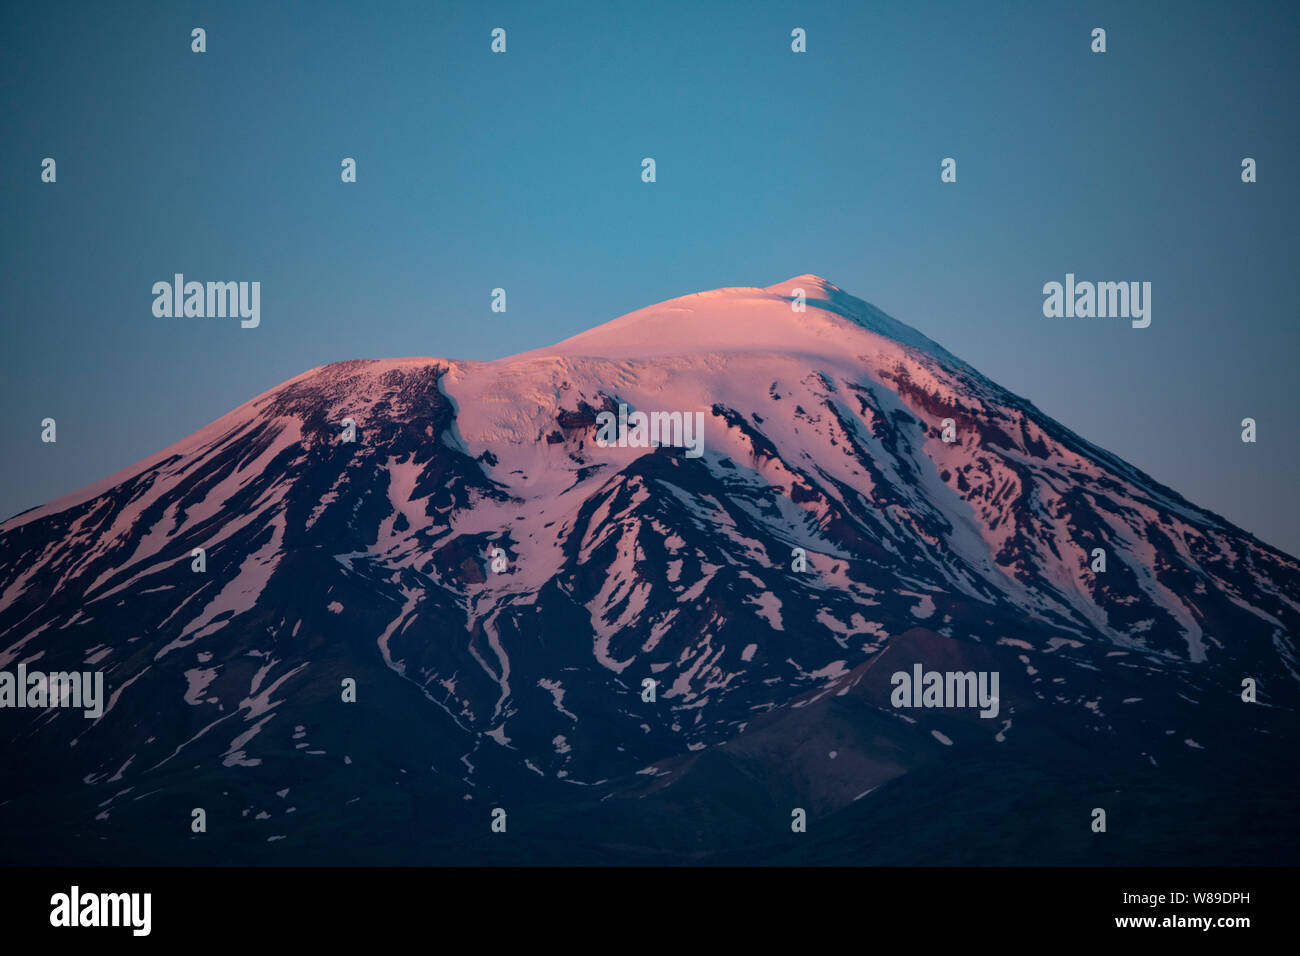 pink, sunset, plateau, grass, sky, blue, scenic, climbing, grassland, turkey, peak, mount, ararat, snow, landscape, nature, volcano, agri, travel, roc Stock Photo